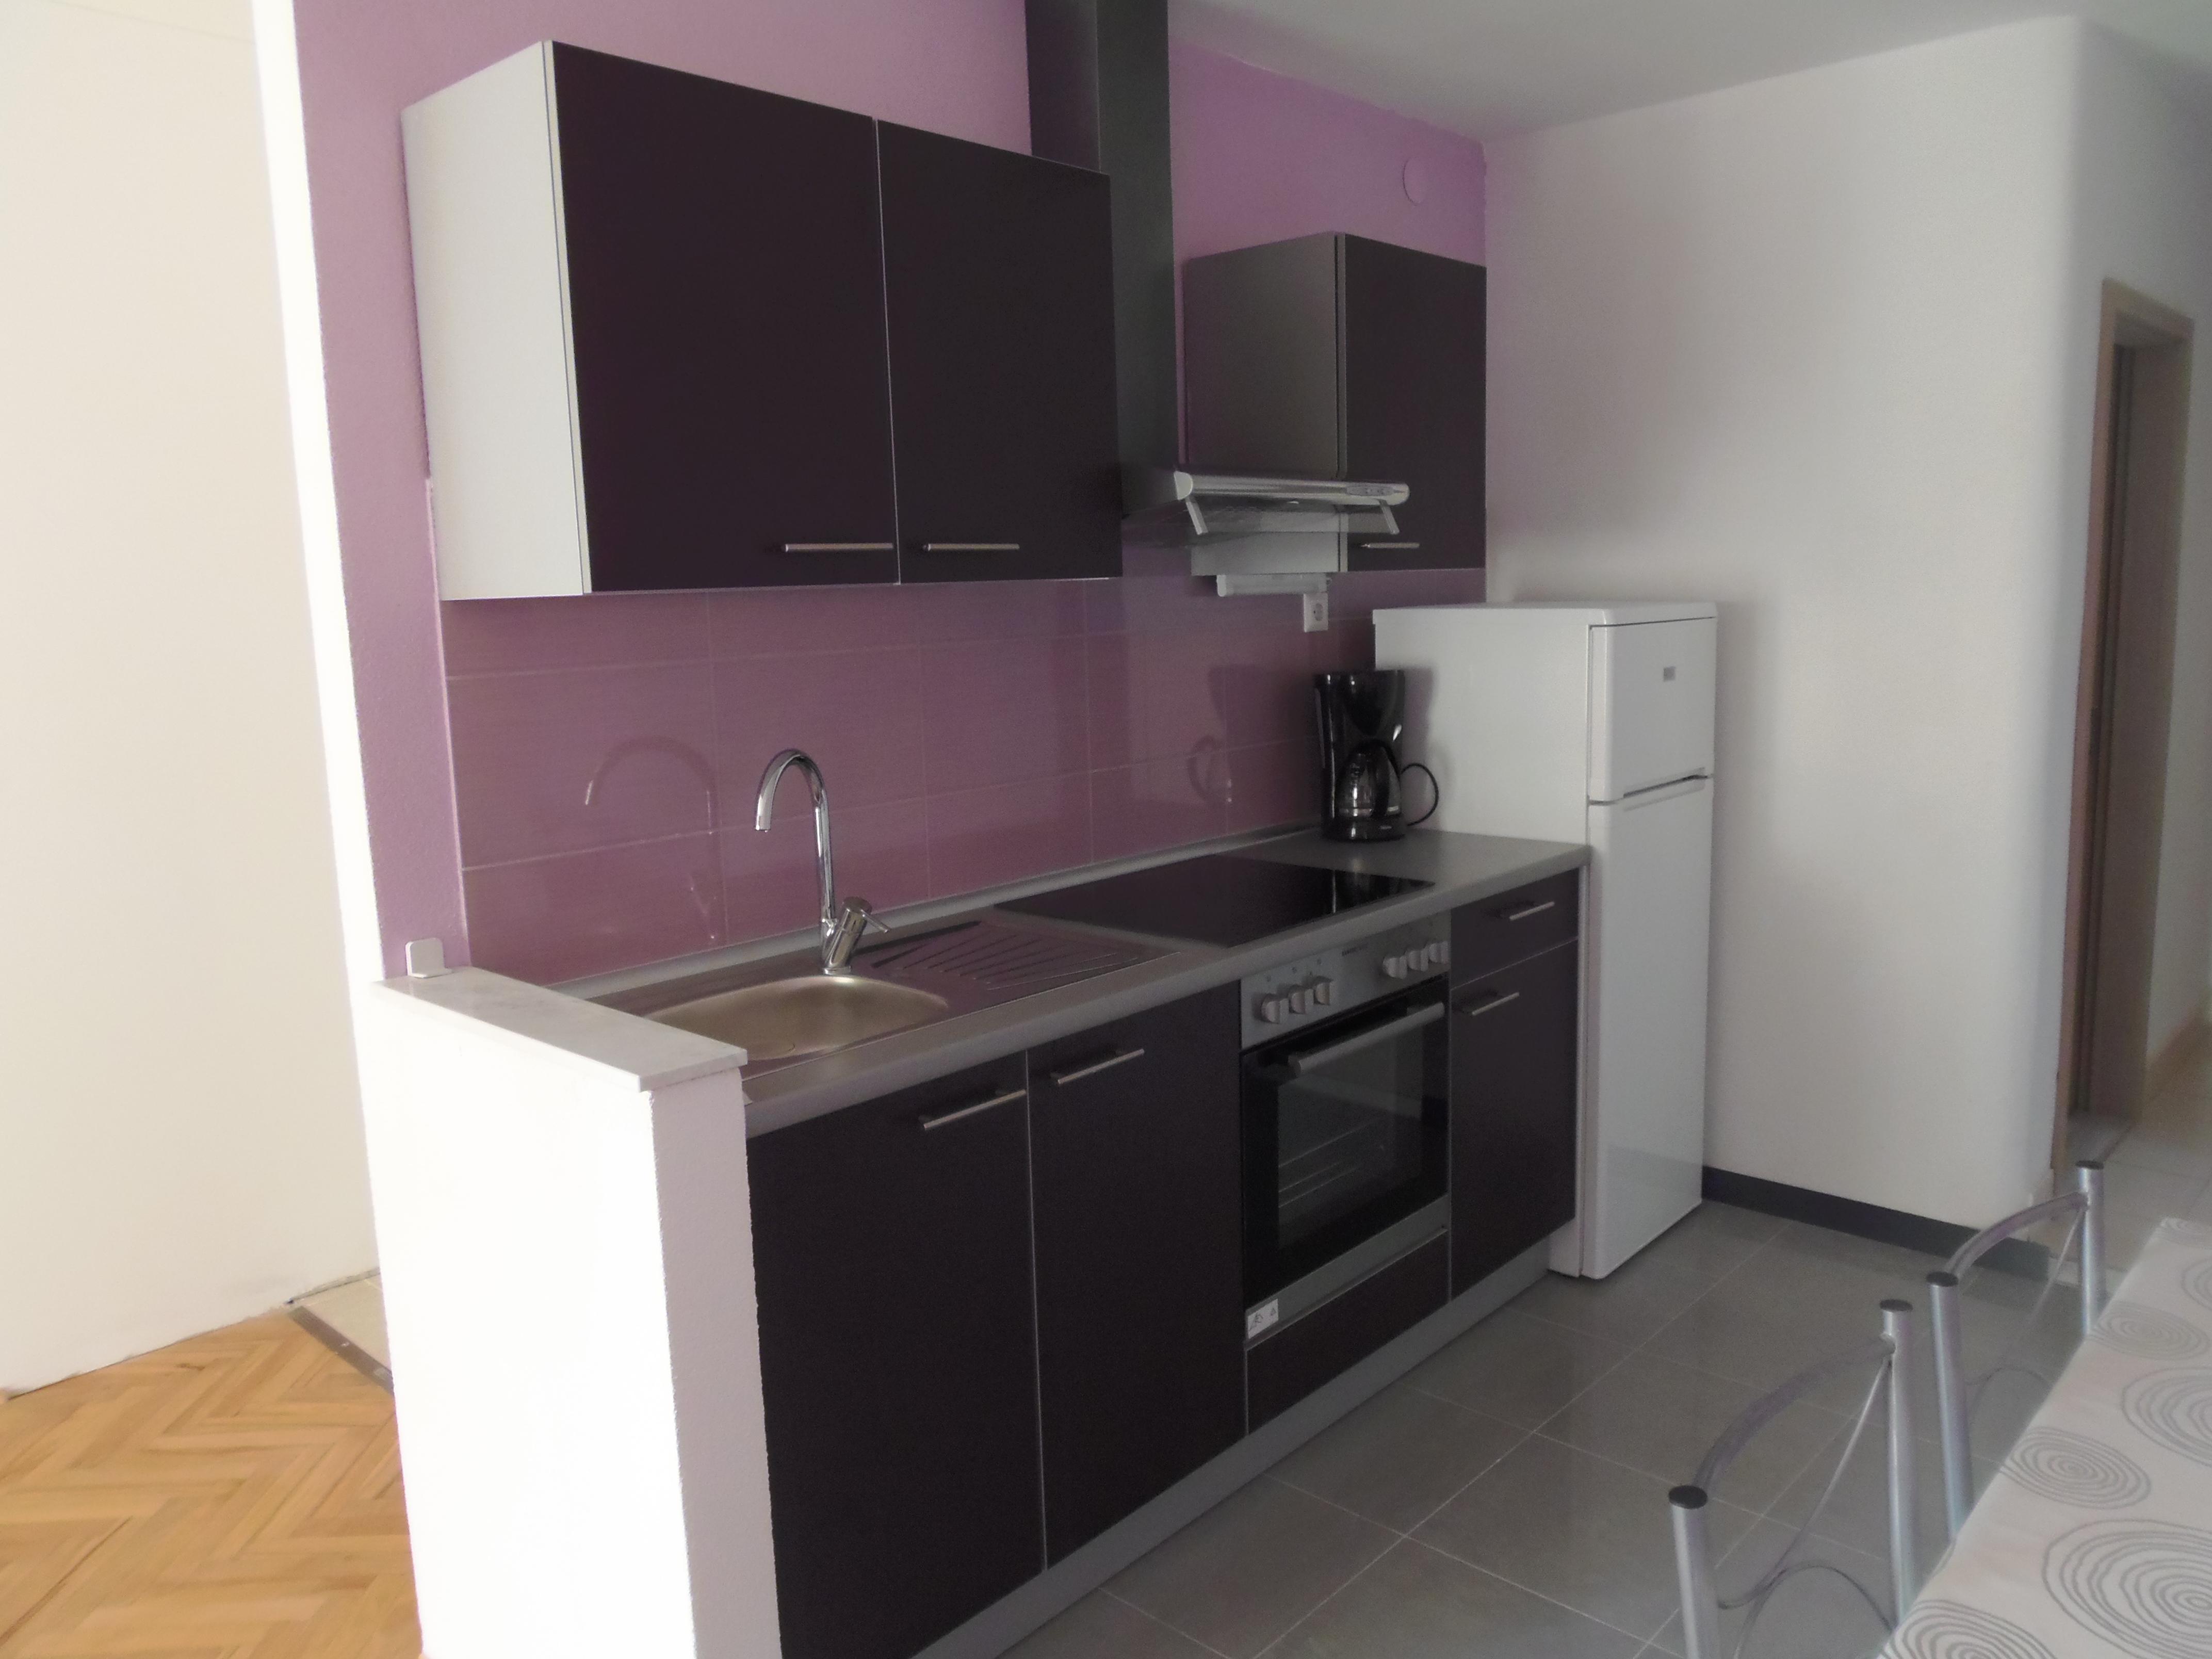 Keuken appartement 2